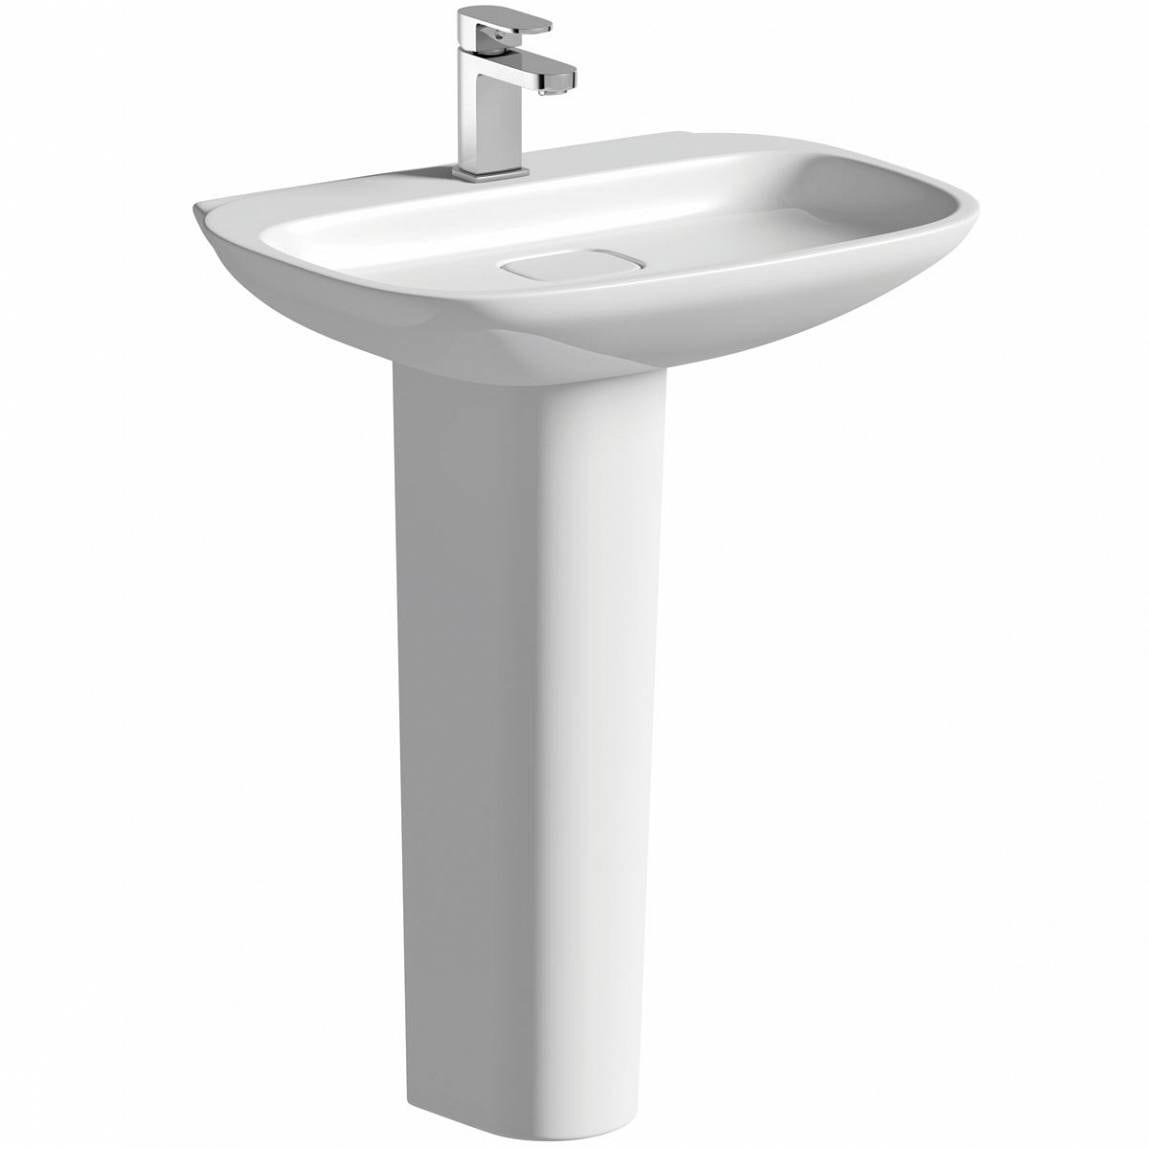 Mode Heath 1 tap hole full pedestal basin 600mm